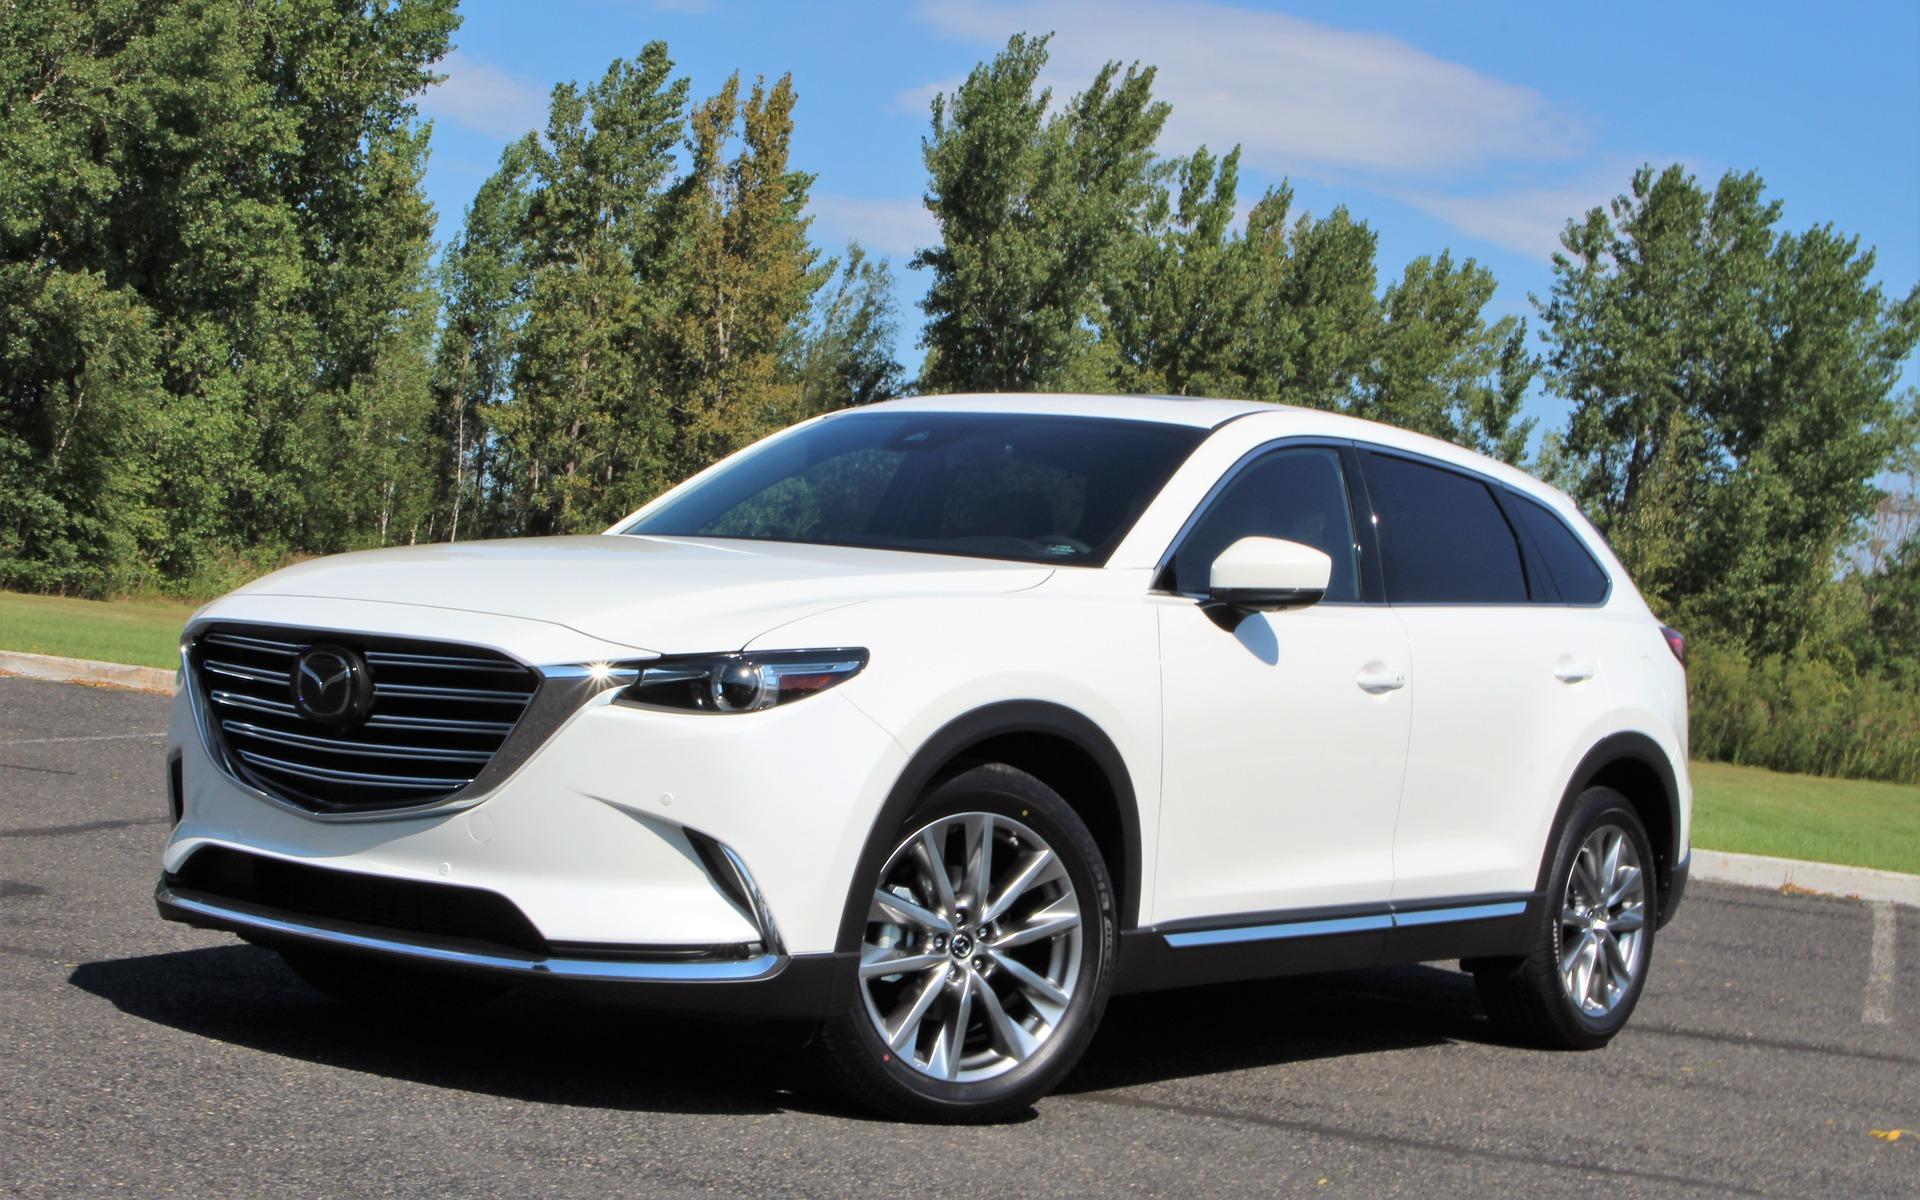 58 New 2020 Mazda Cx 9 Update Overview for 2020 Mazda Cx 9 Update